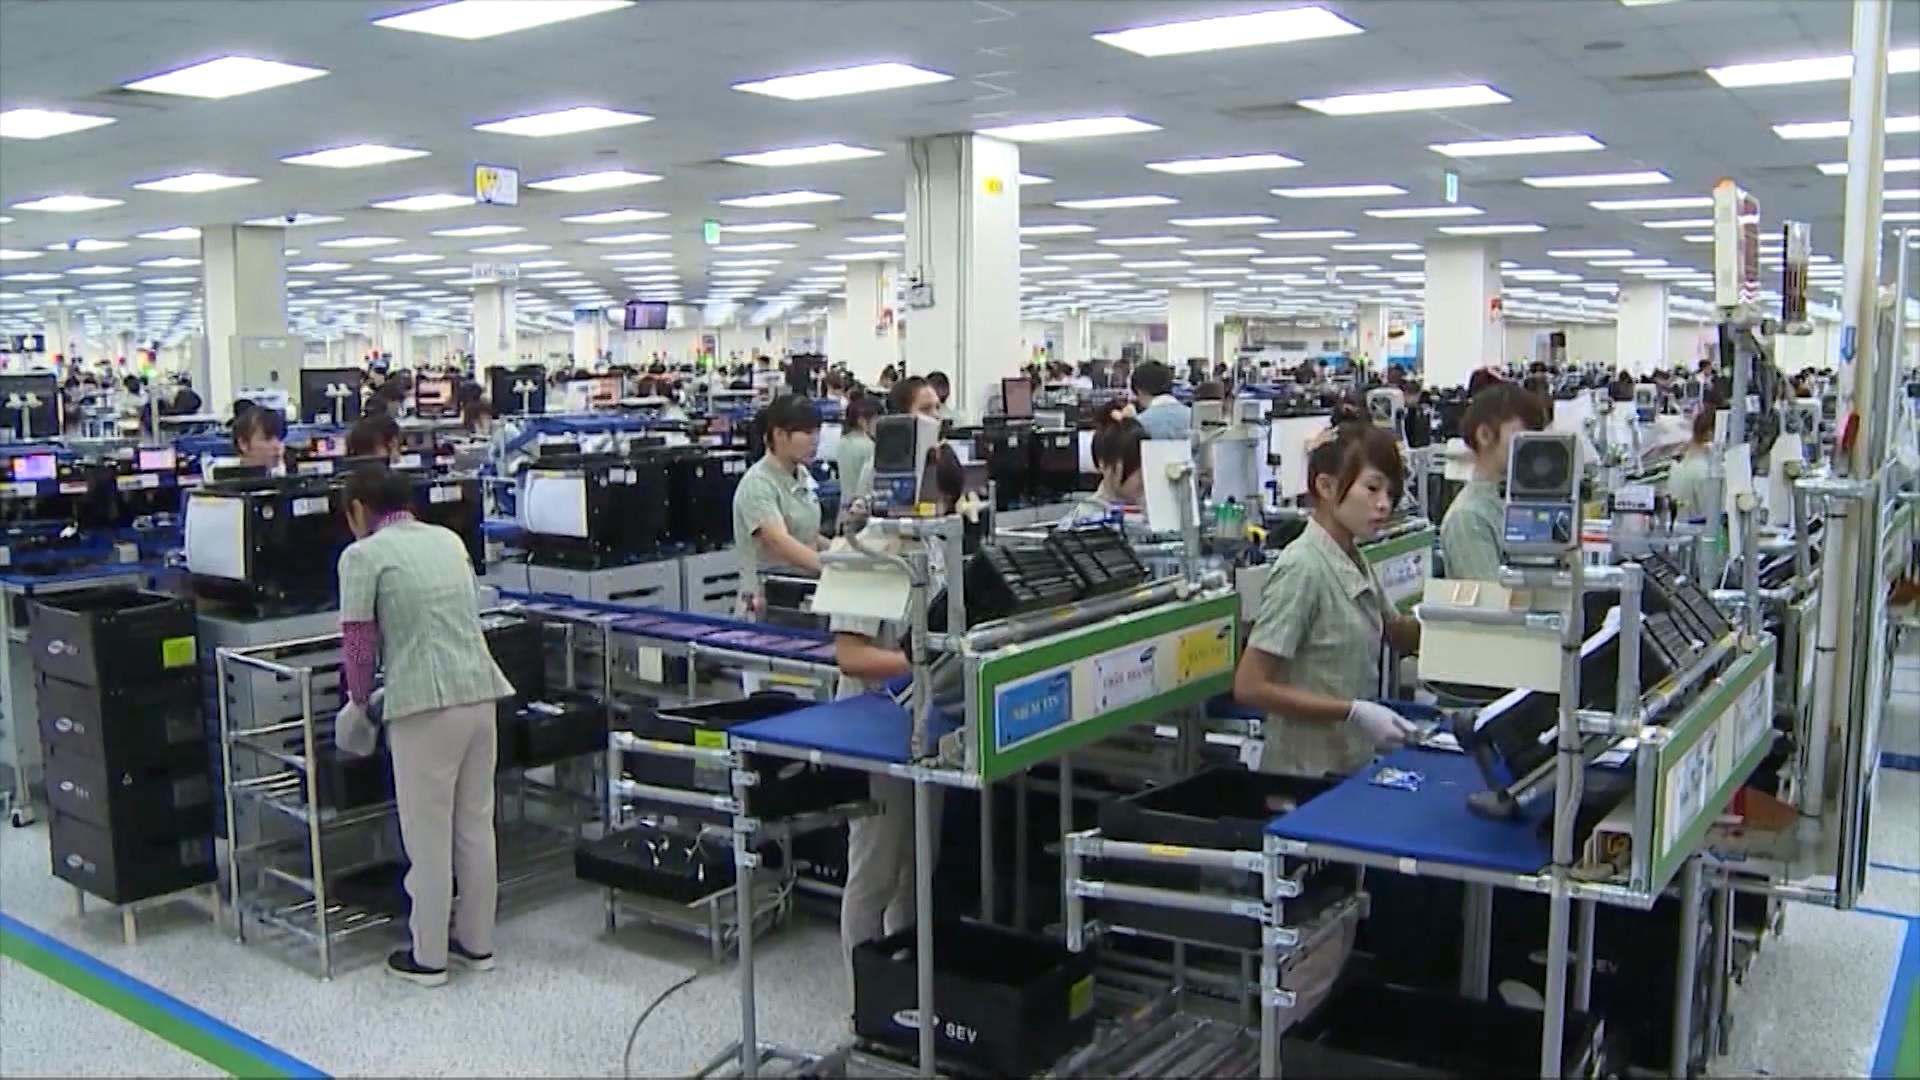 Kinh tế Bắc Ninh nỗ lực vượt khó về đích